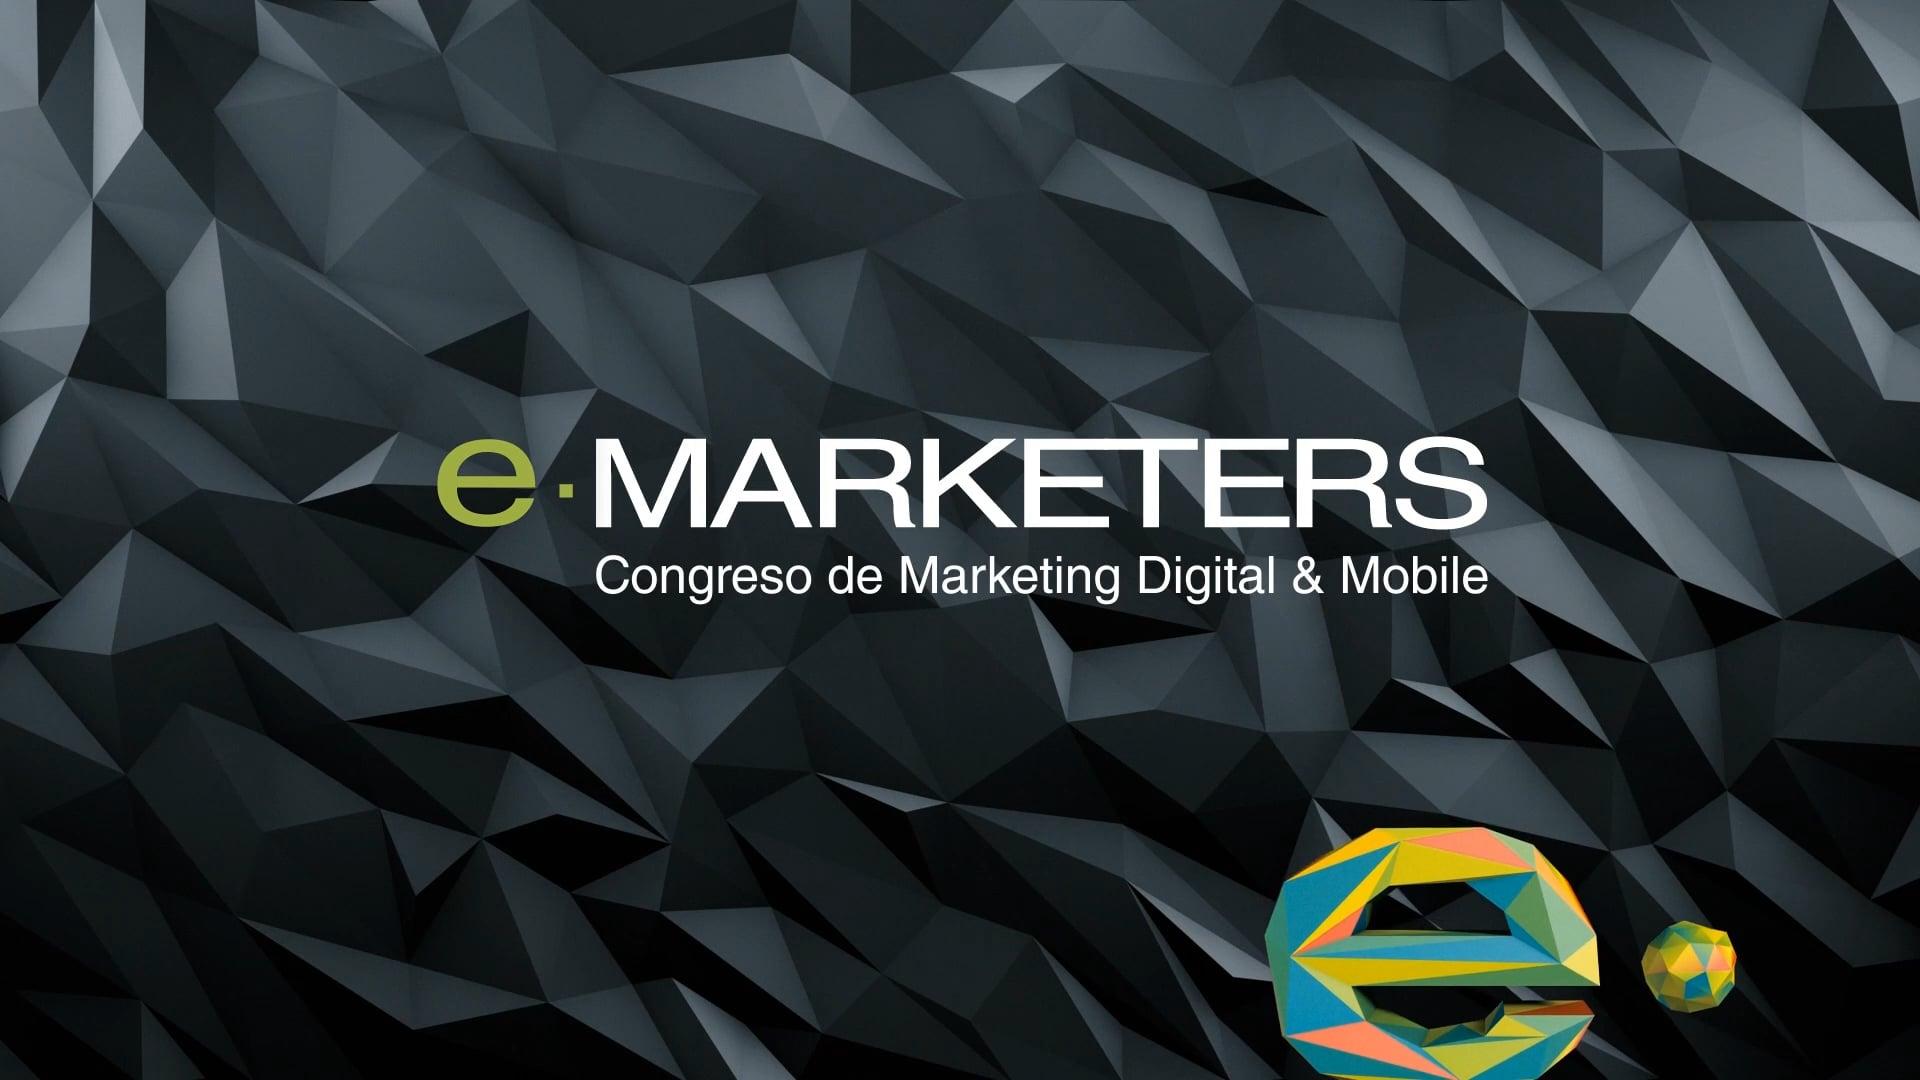 e.marketers   Congreso de Marketing Digital & Mobile